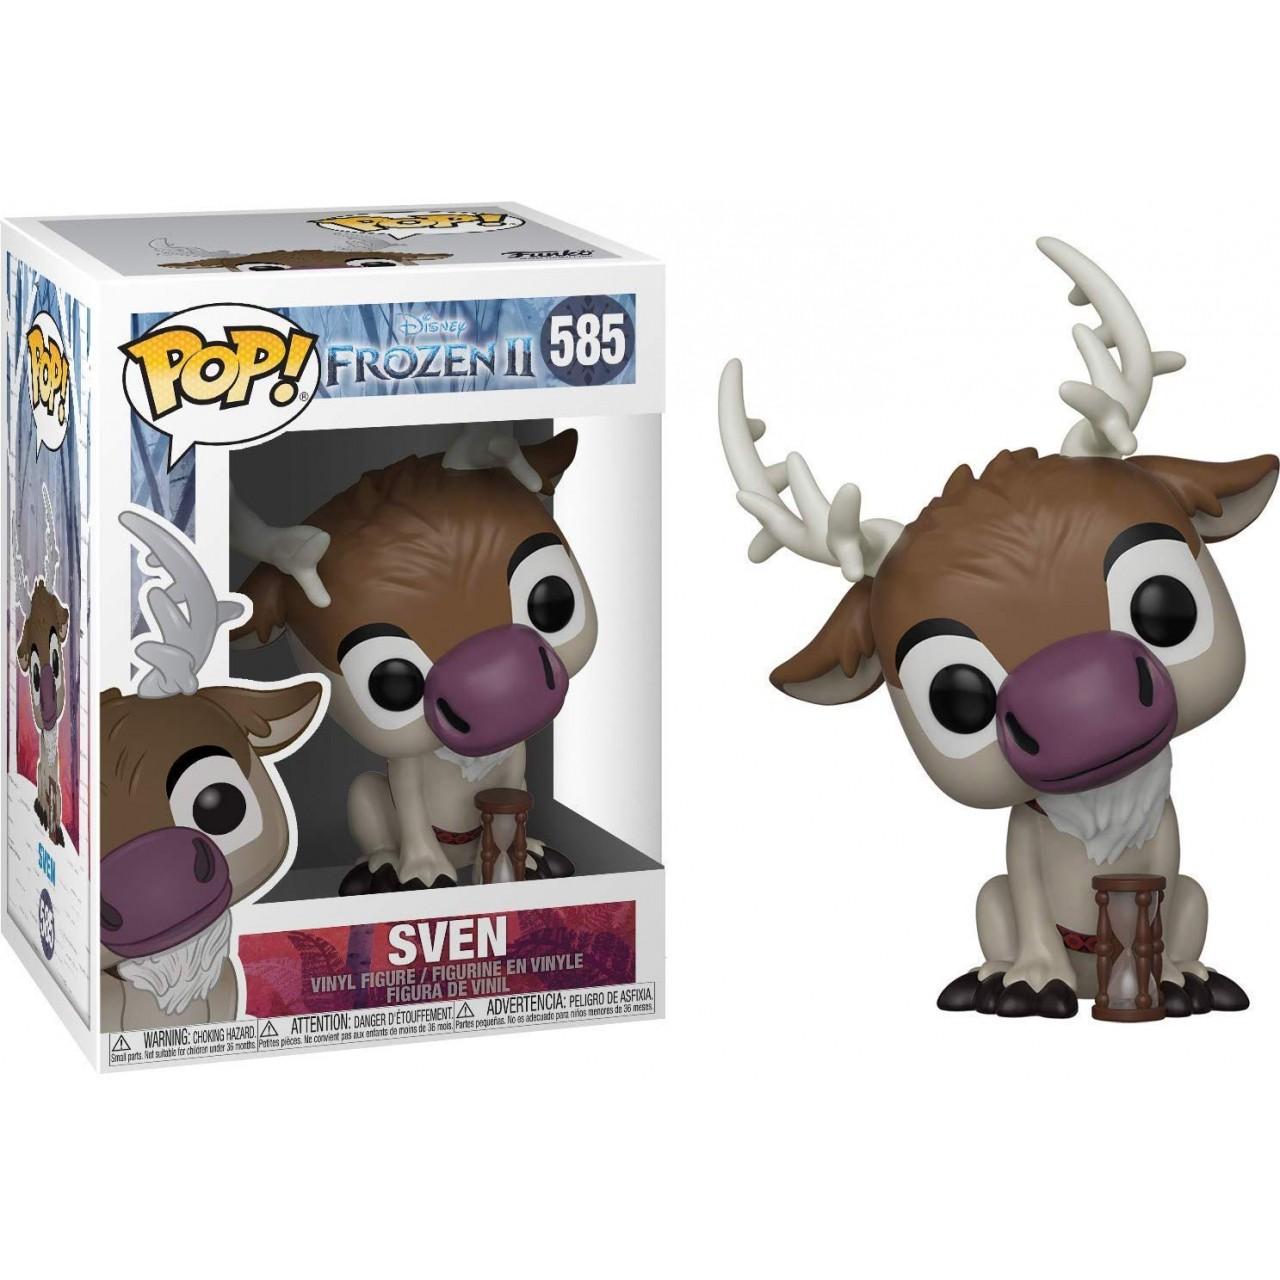 "Фигурка Funko Pop Дисней ""Холодное сердце"": Свен (42702) #585 Frozen Sven"